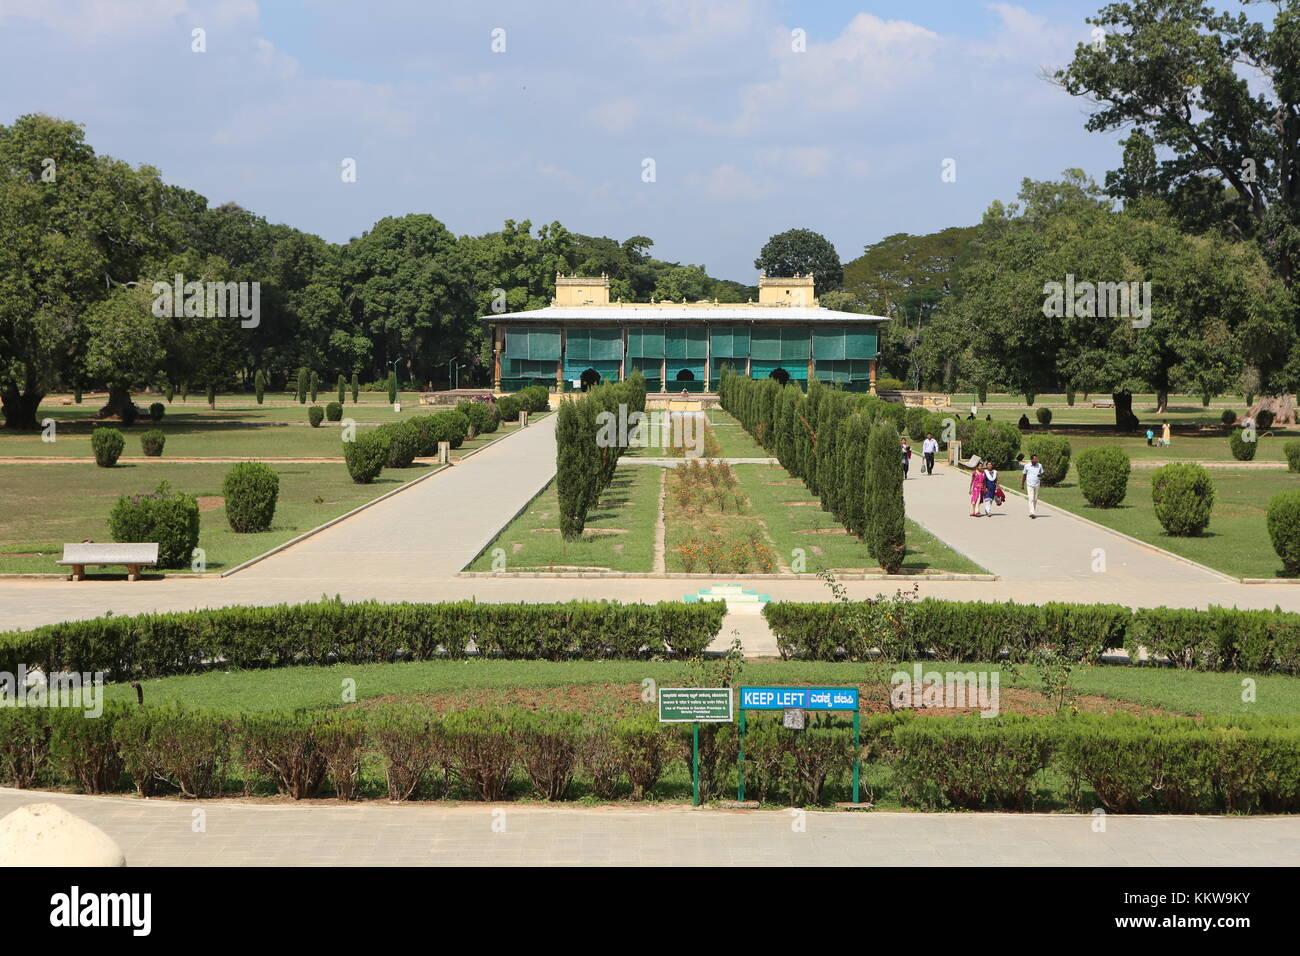 Südindien - Indien - Karnataka - Srirangapatna, Daria Daulat Bagh Parkanlage Stockbild